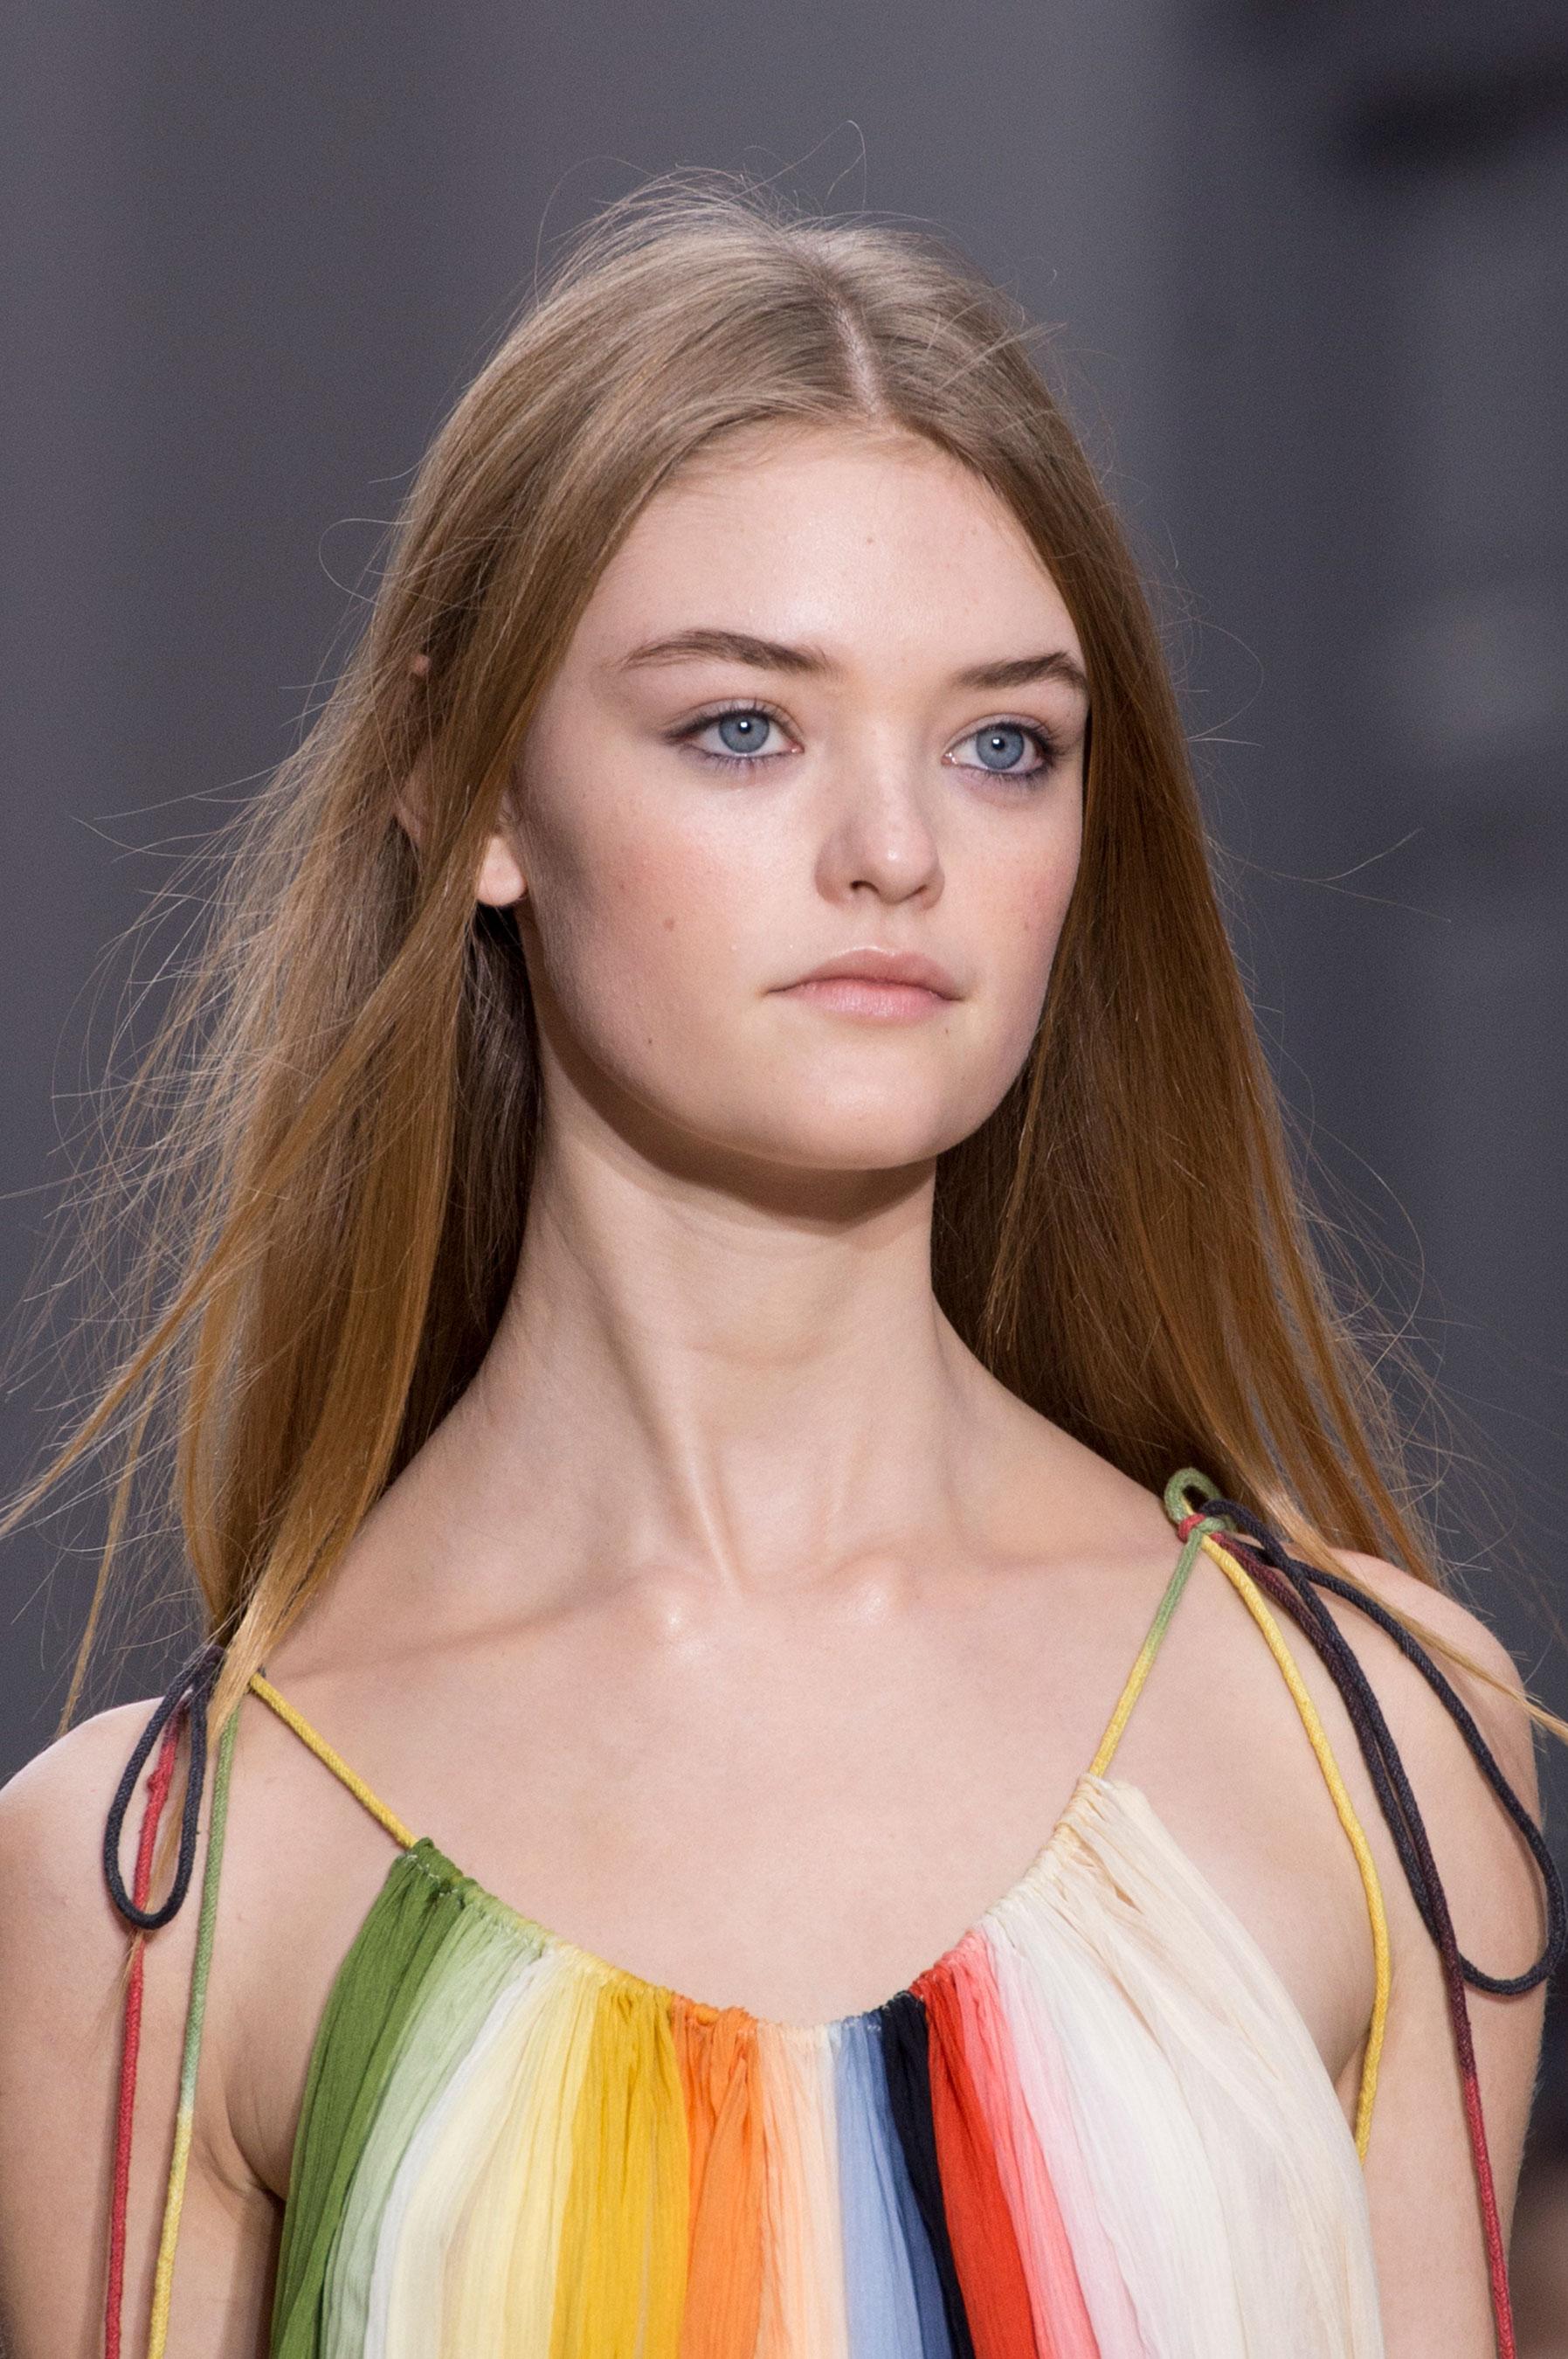 Chloe-spring-2016-runway-beauty-fashion-show-the-impression-16